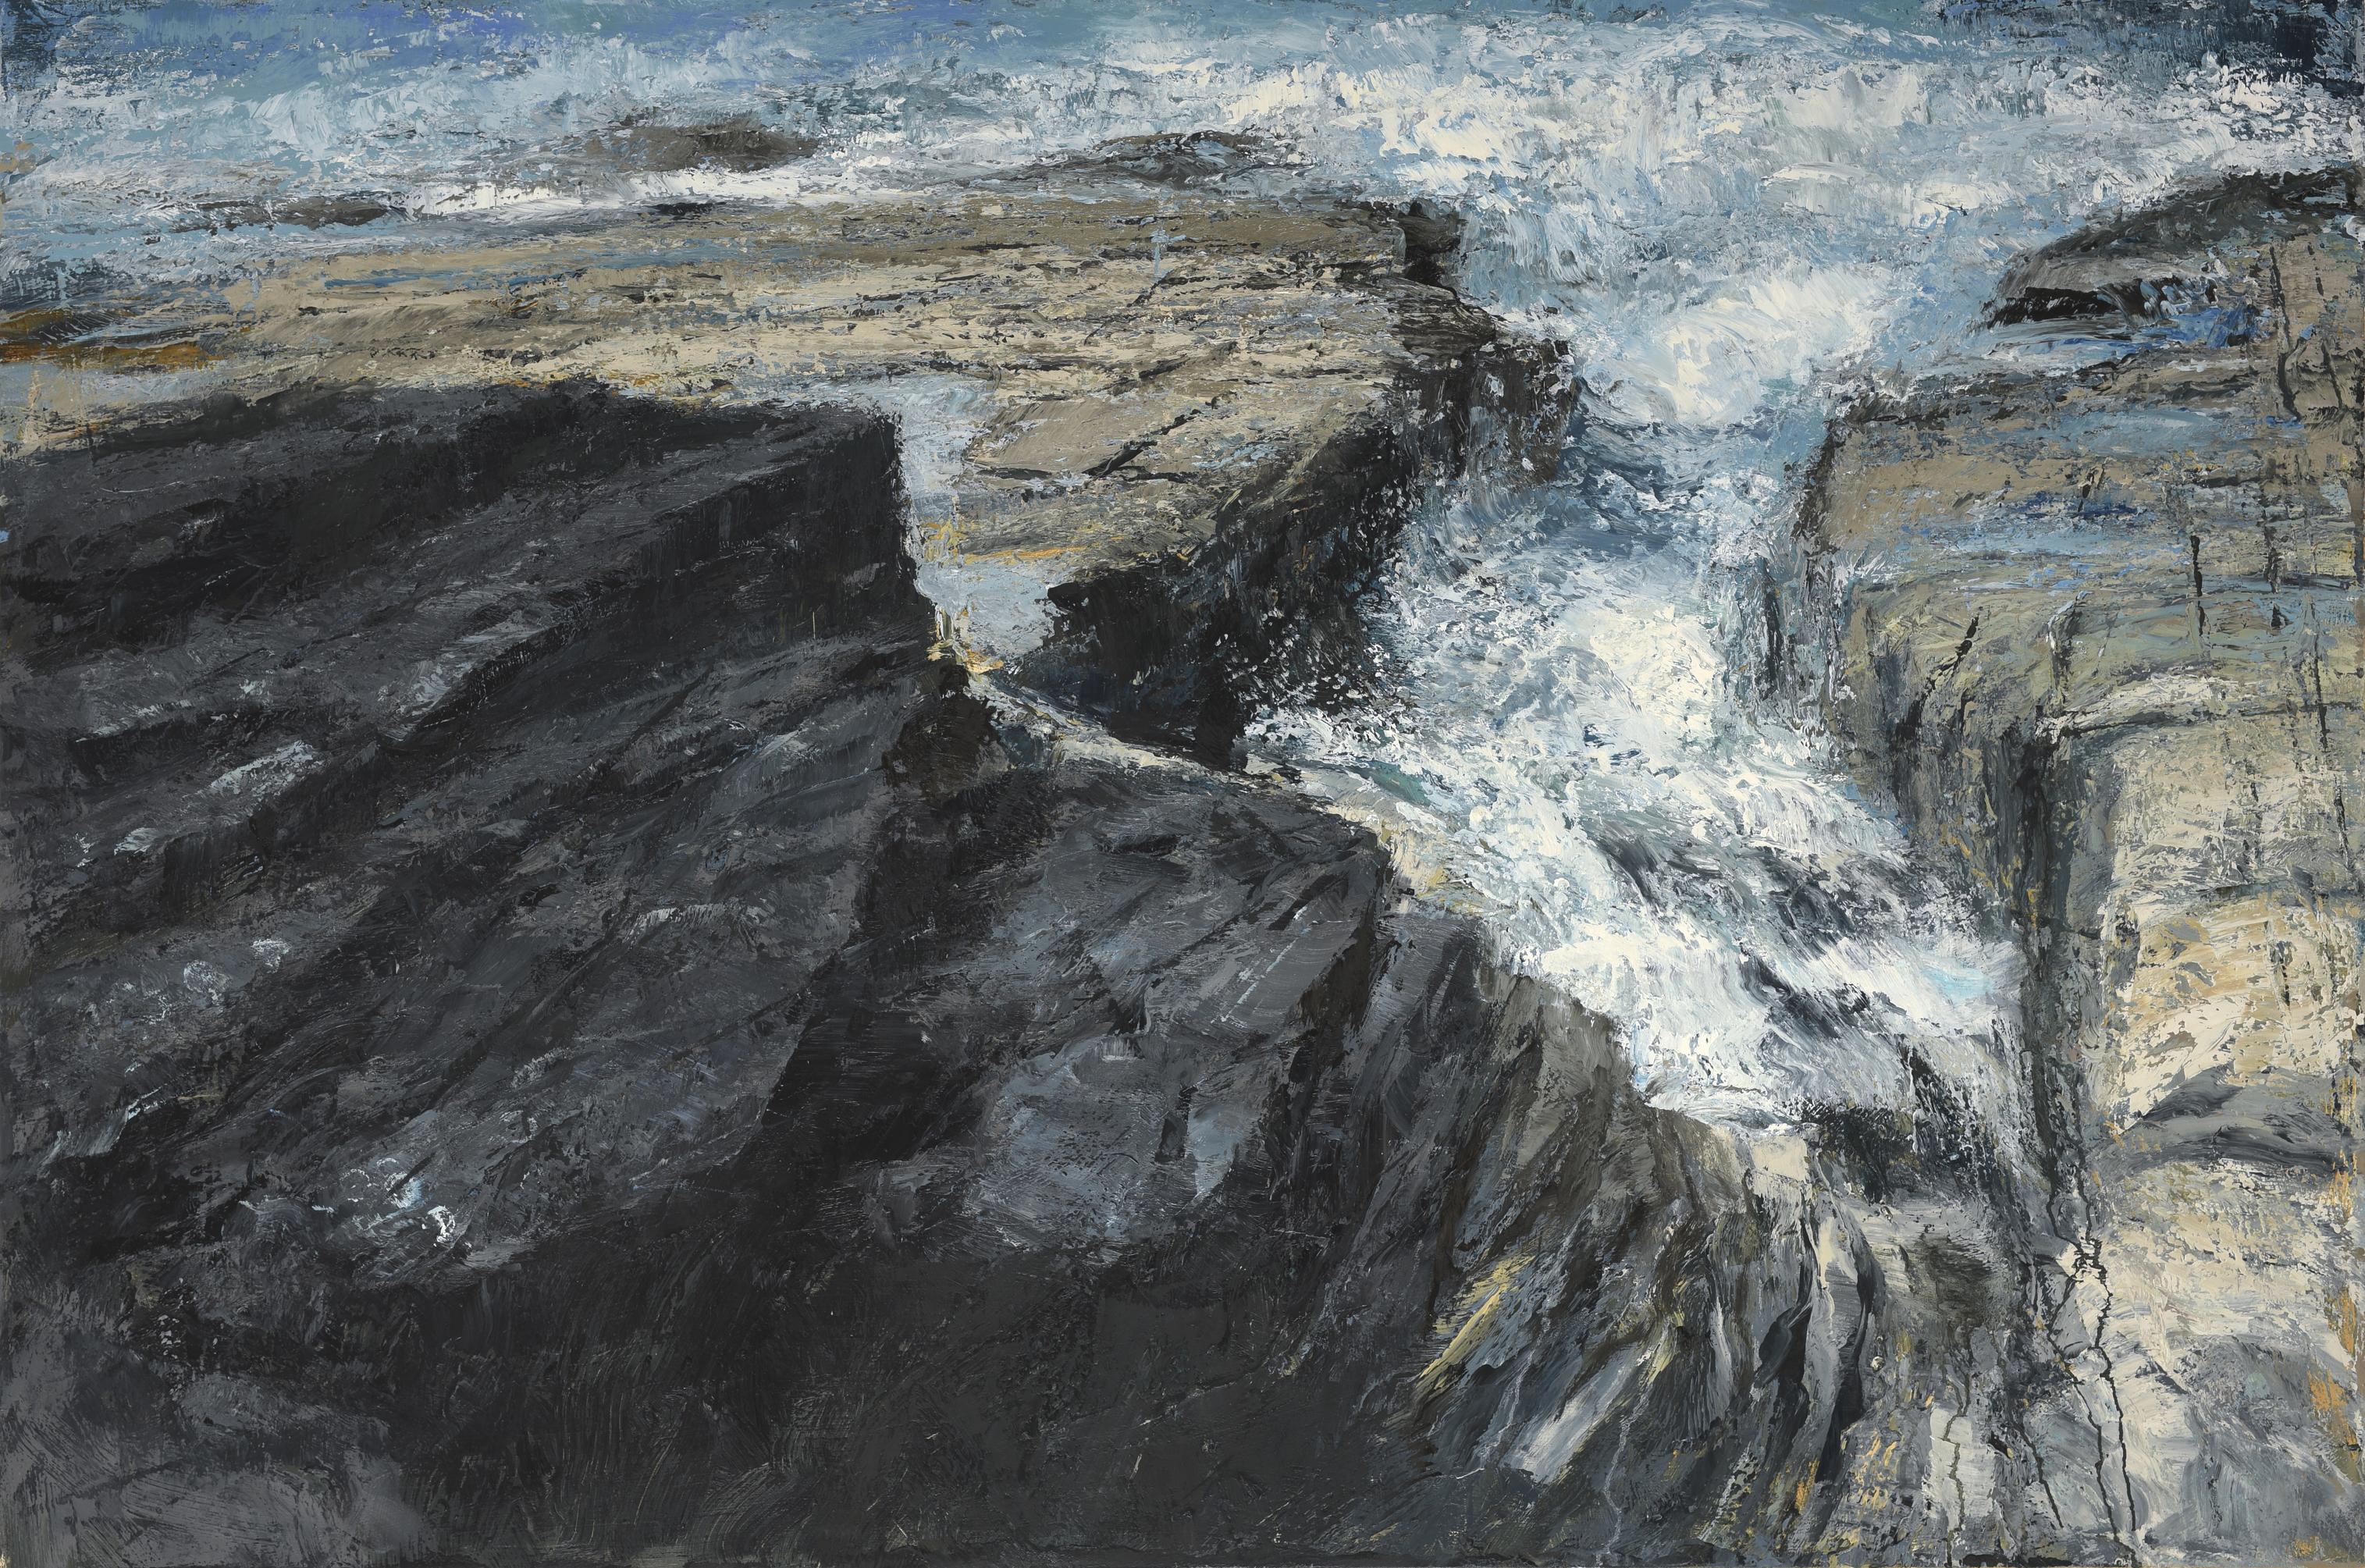 Tidal Rocks